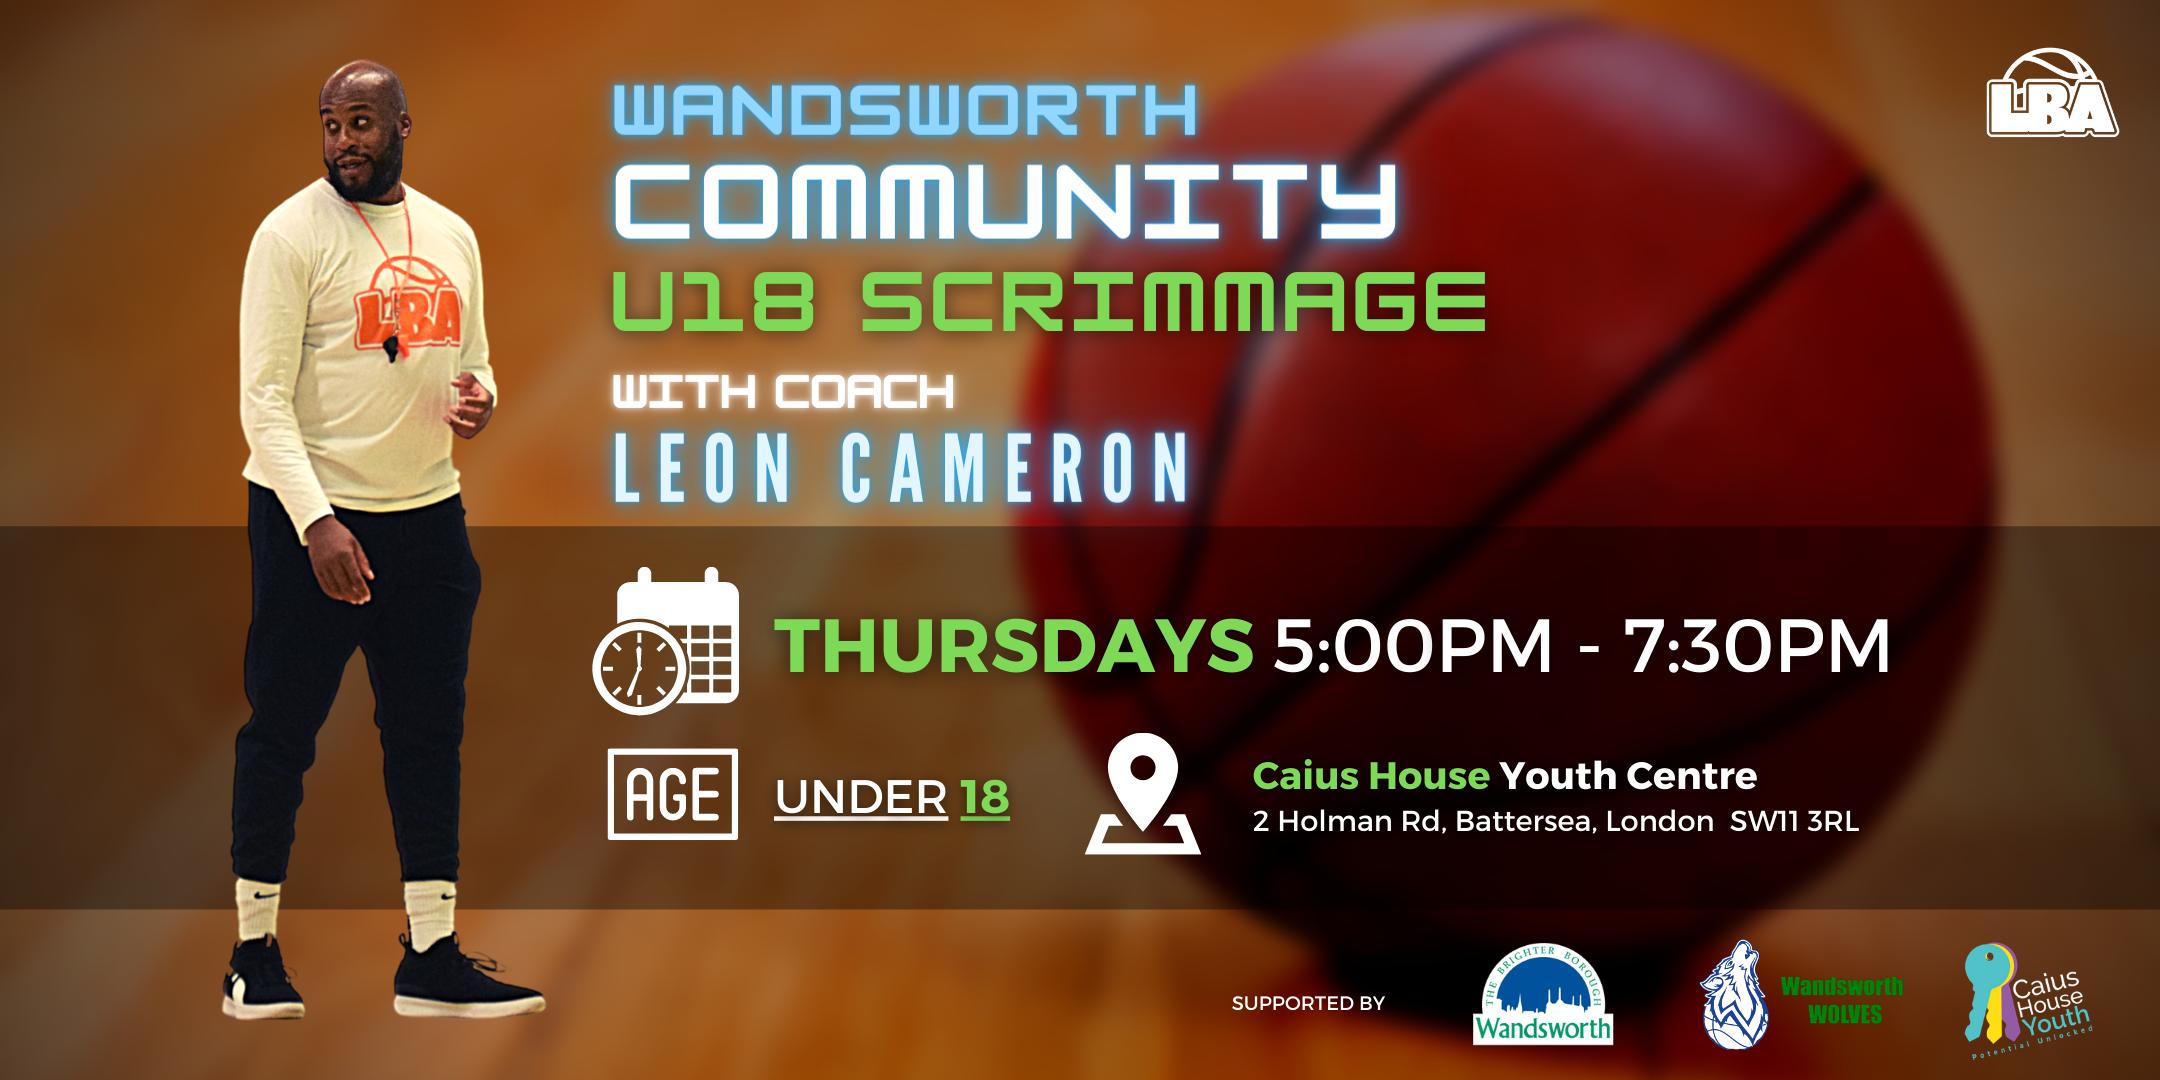 U18 Wandsworth Community Scrimmages - Weekly Basketball